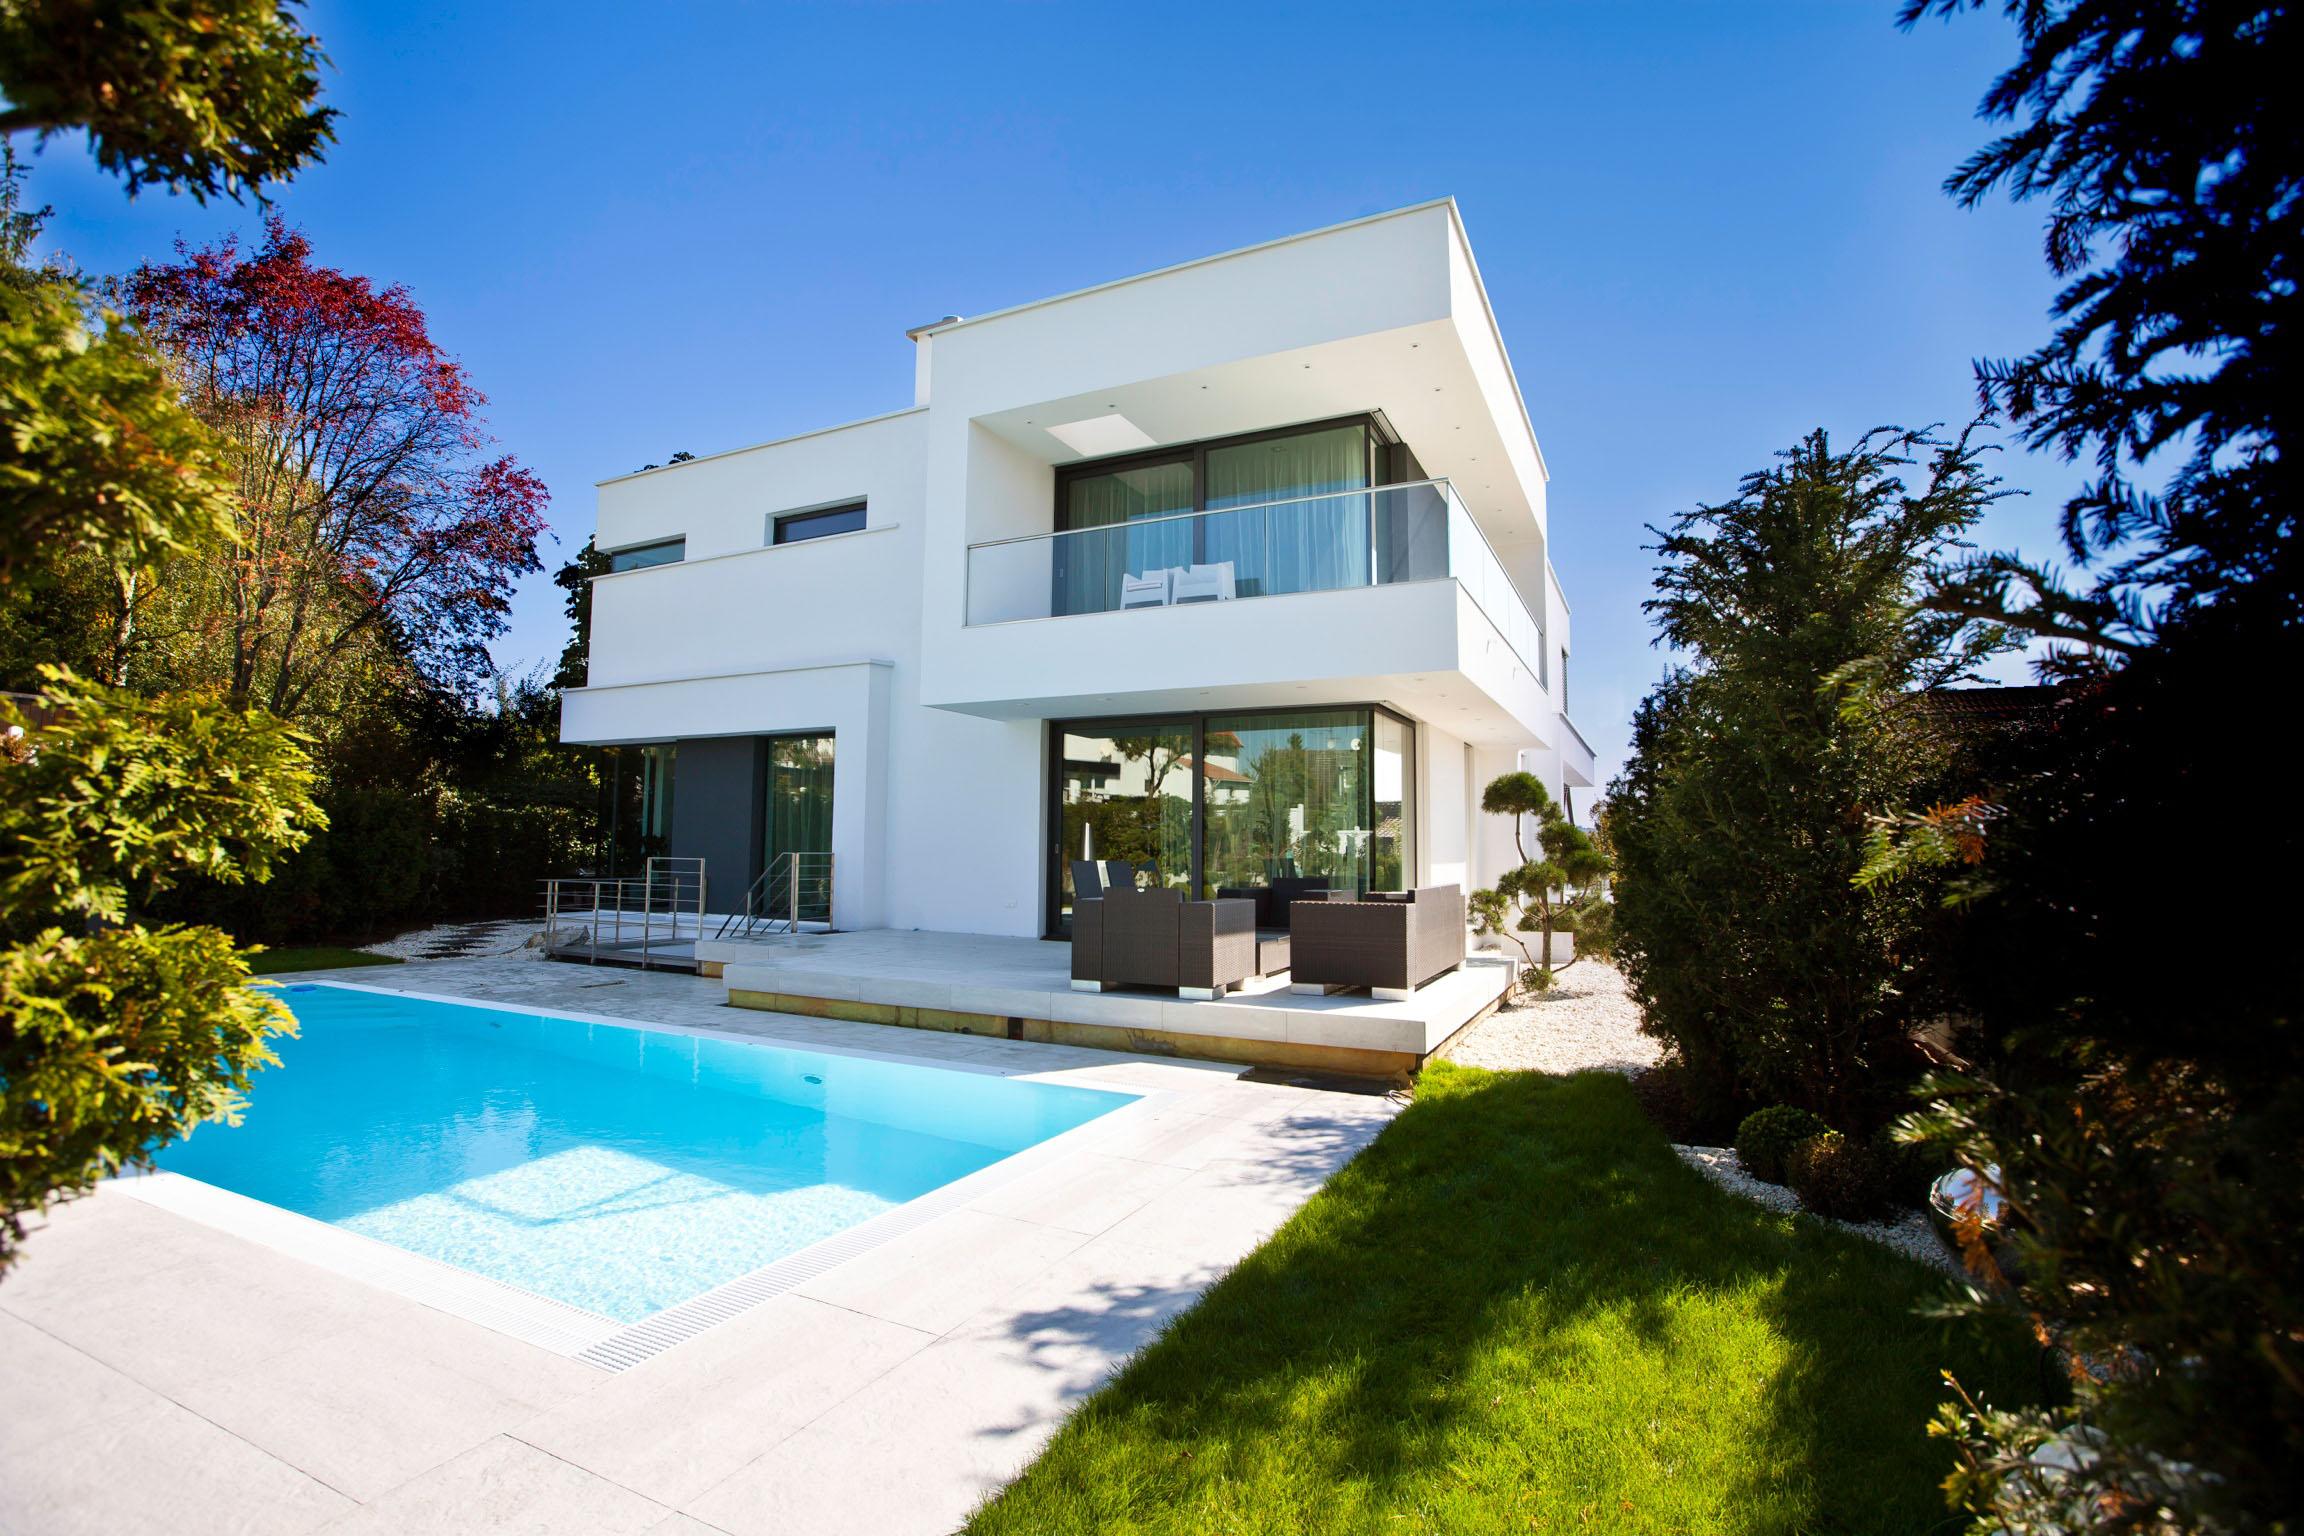 Design Haus - Design and House Design Propublicobono.Org